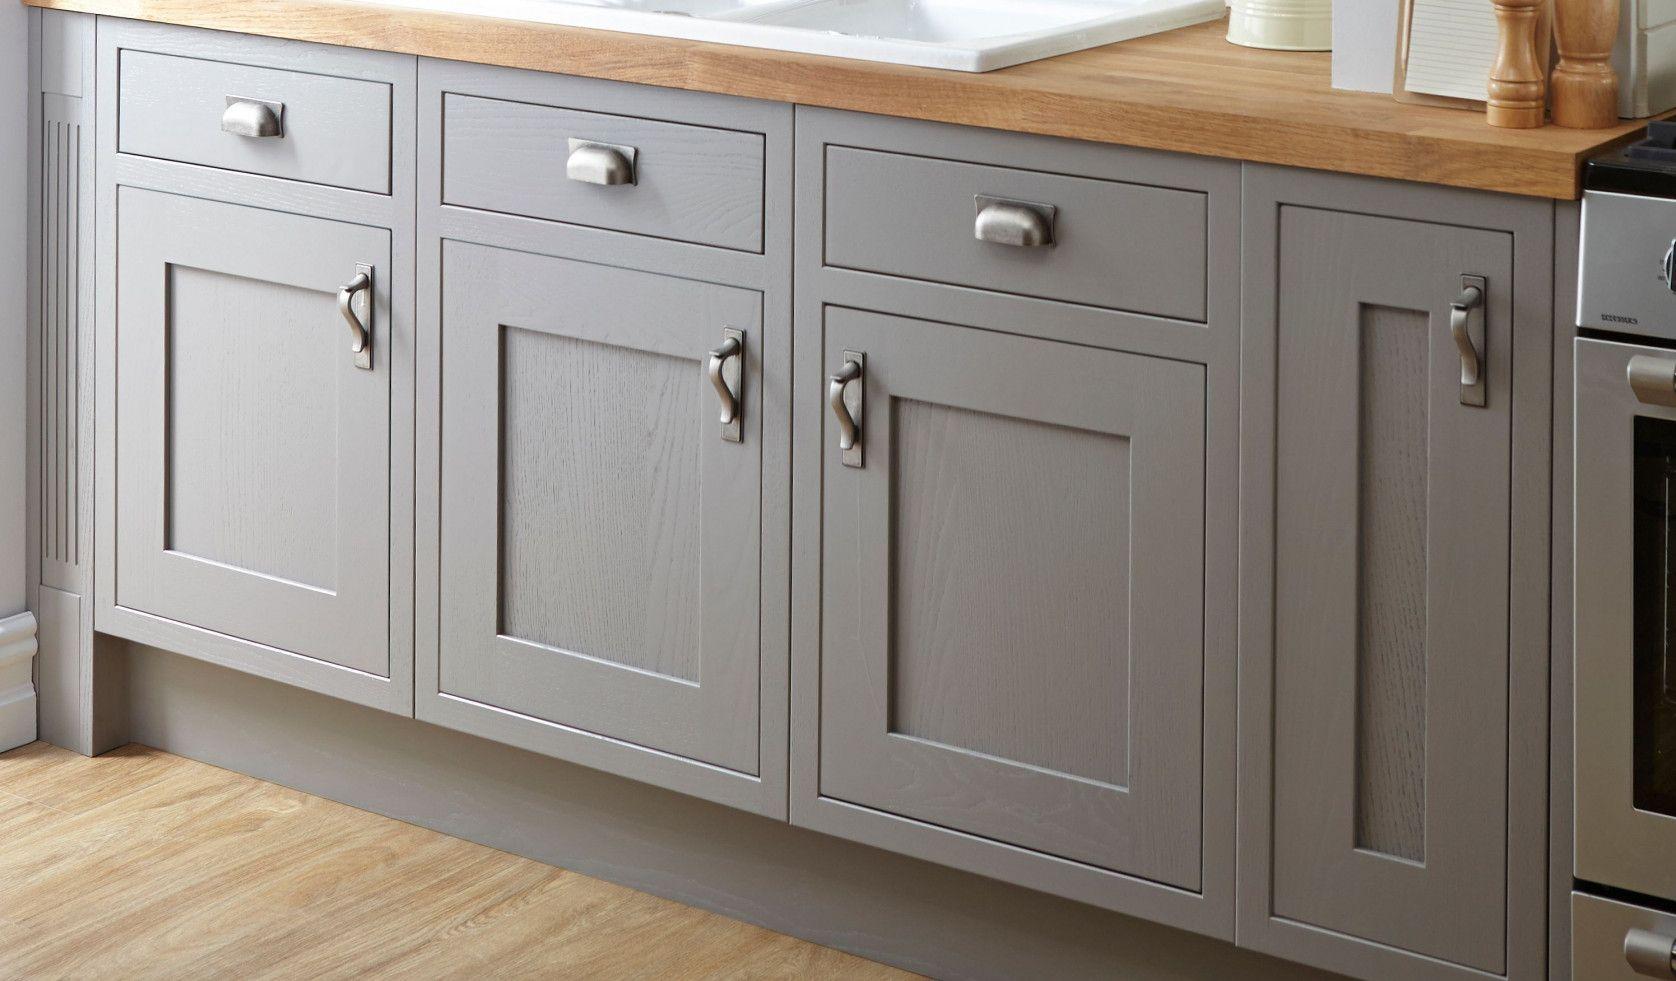 2018 Replacement Kitchen Cabinet Doors - Kitchen Cabinet ...